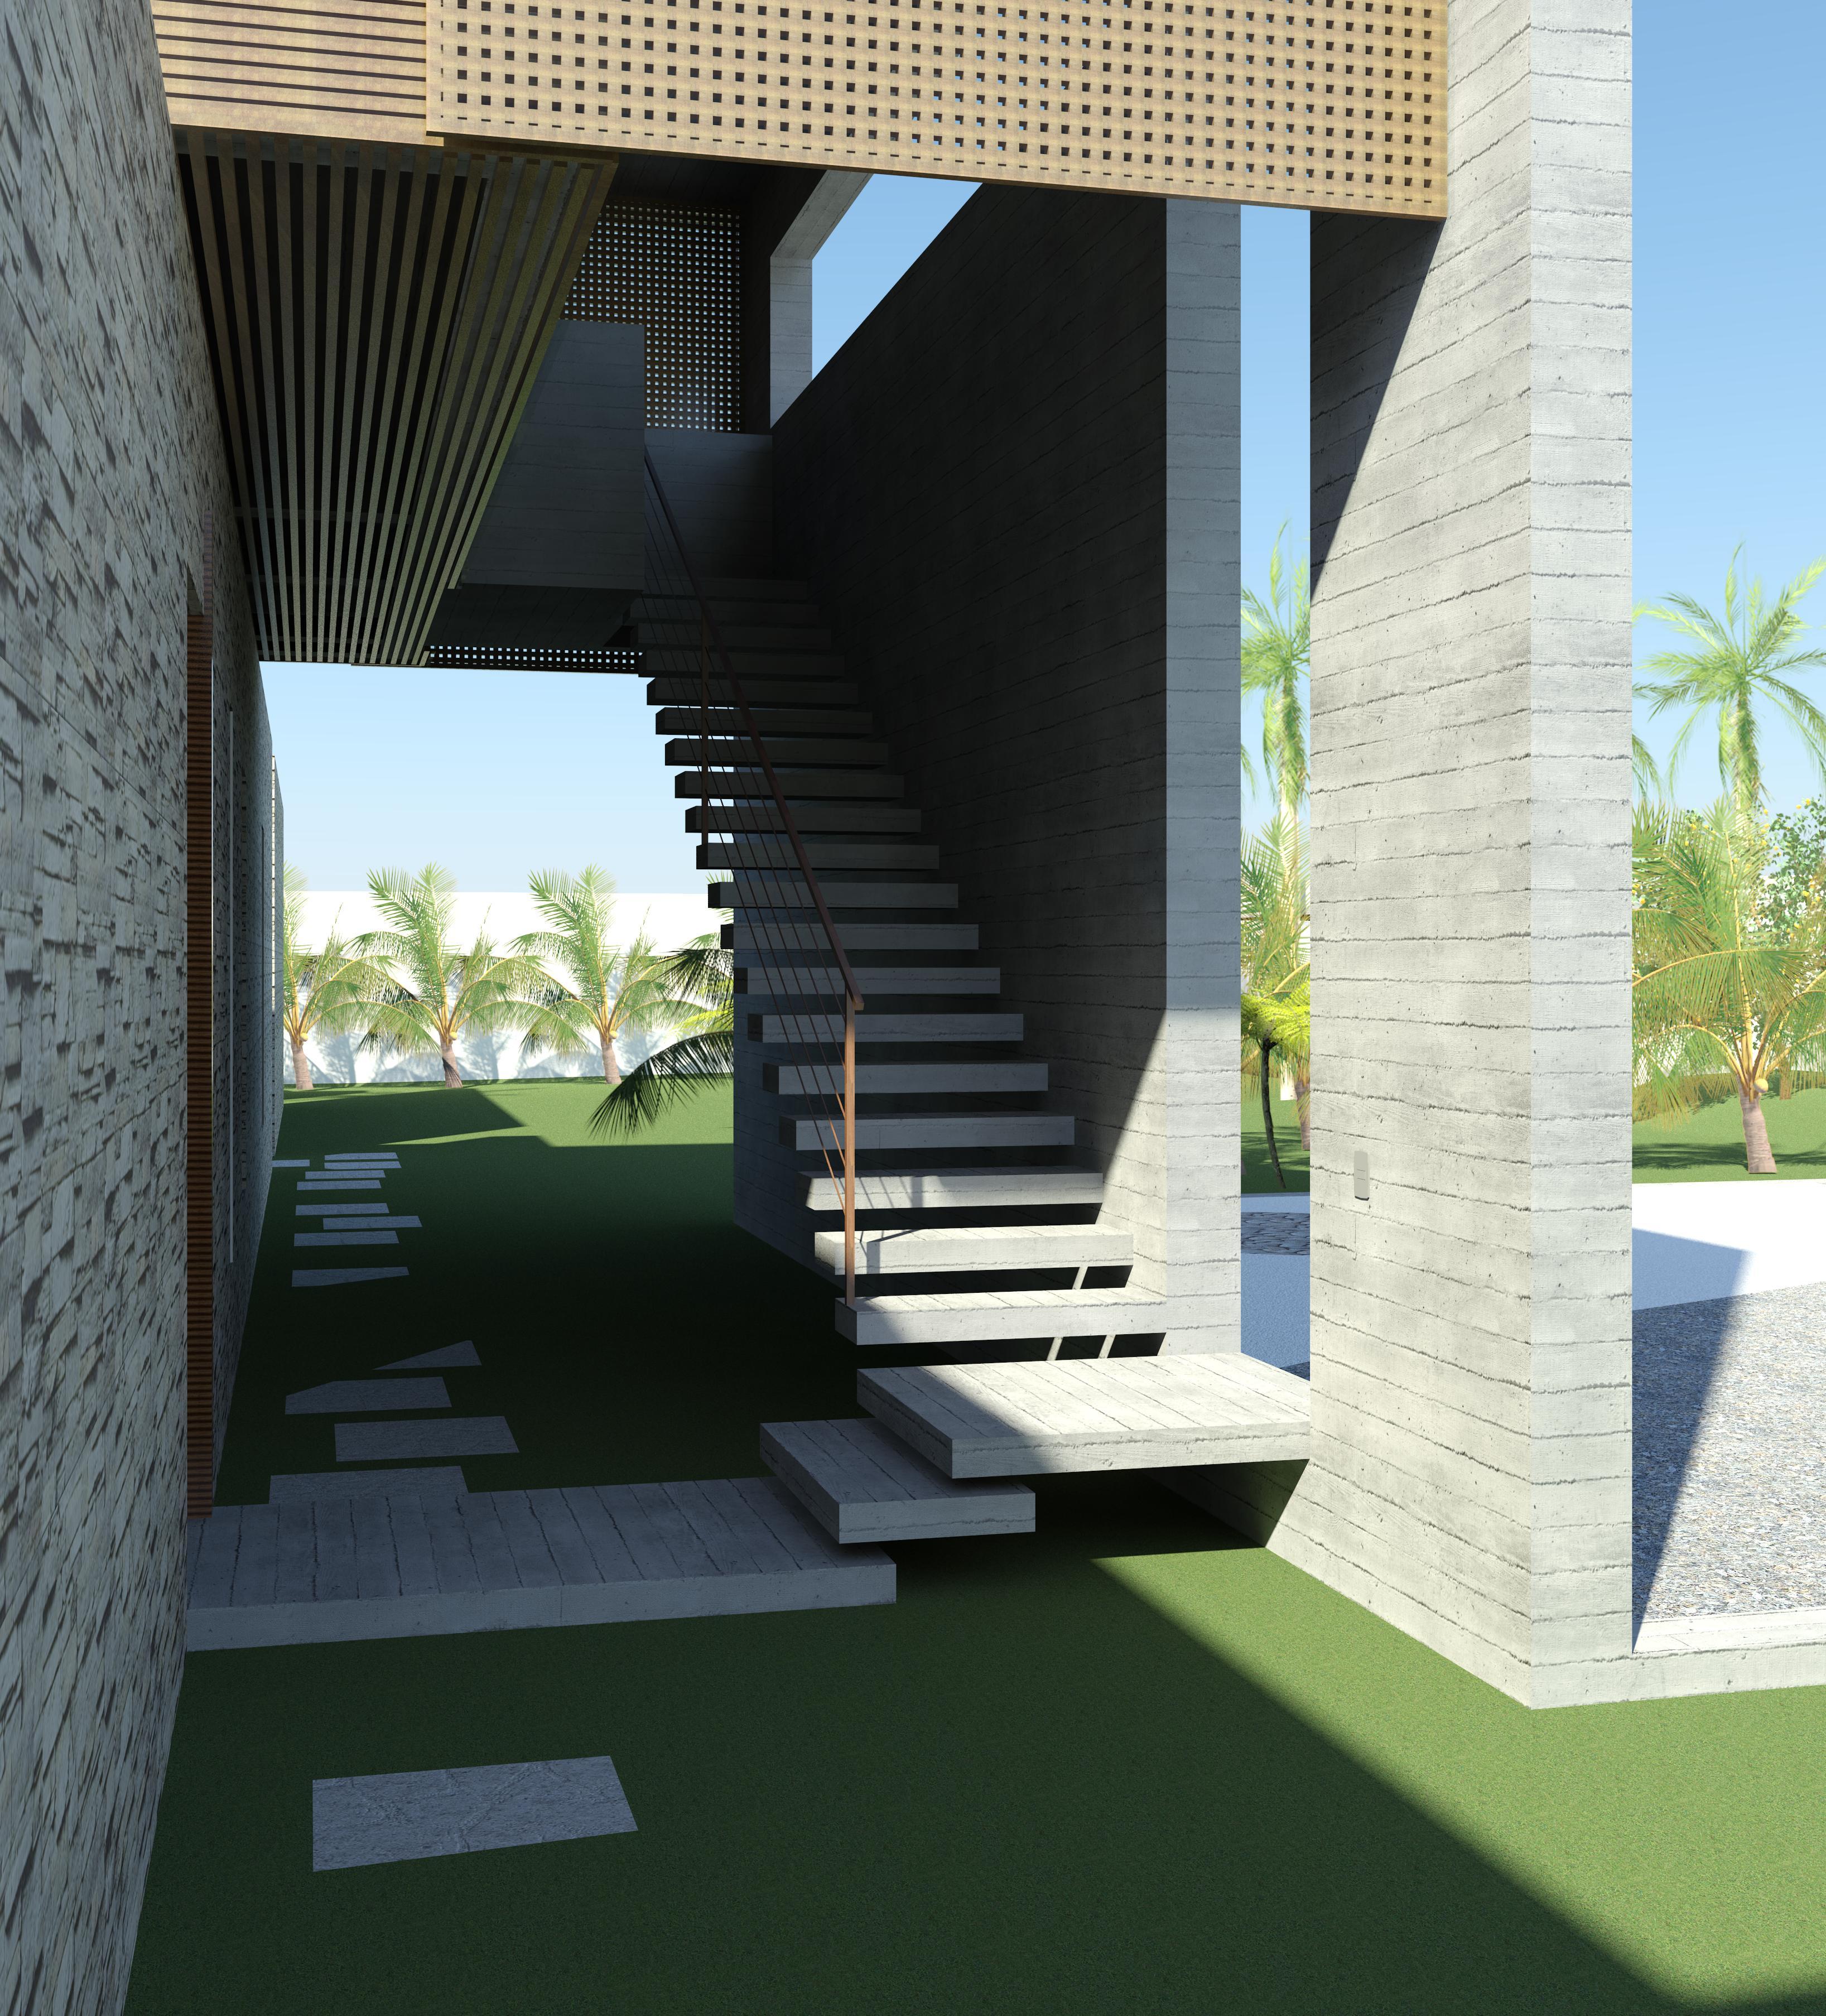 pers-escada1-2.jpg